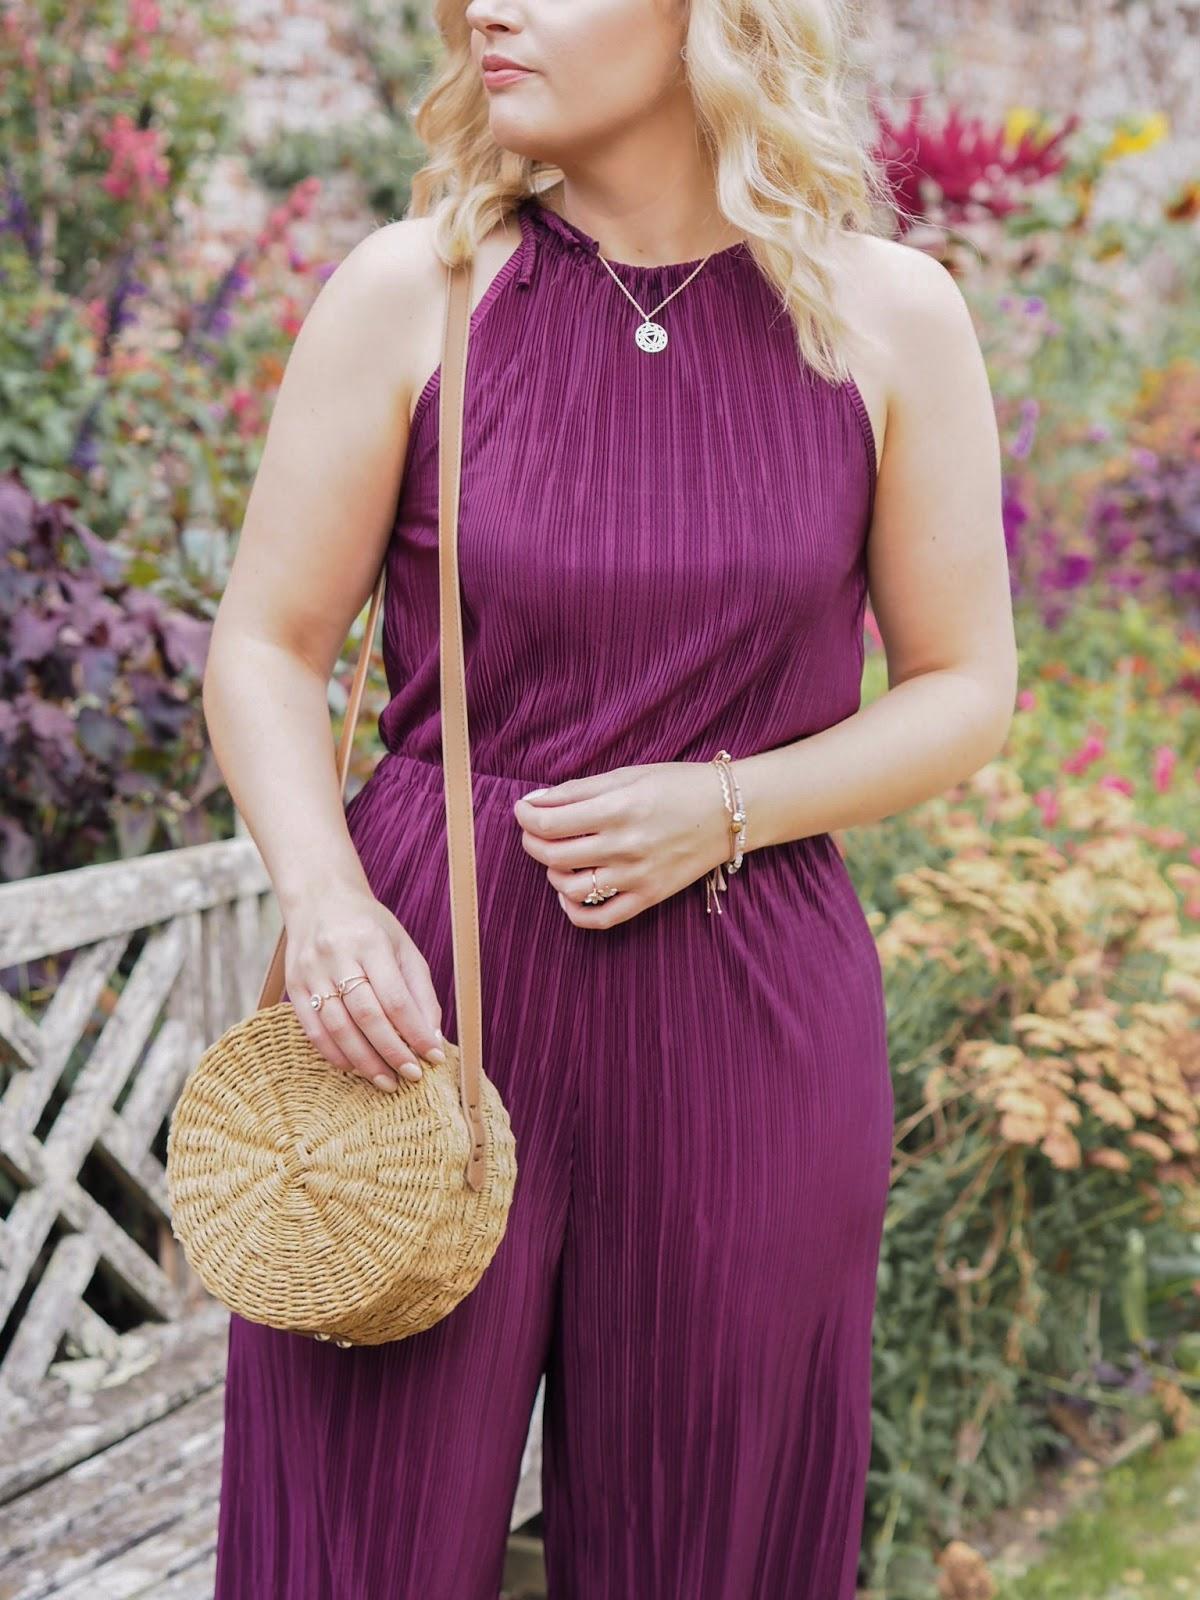 How Blogging Has Opened Up My Small World, UK Bloggers, Fashion Blogger, Daisy London, Daisy Jewellery, Miss Selfridge, Style Blogger, Lifestyle Blogger, Blogging Advice, Blogging with a Chronic Illness, Ehlers Danlos